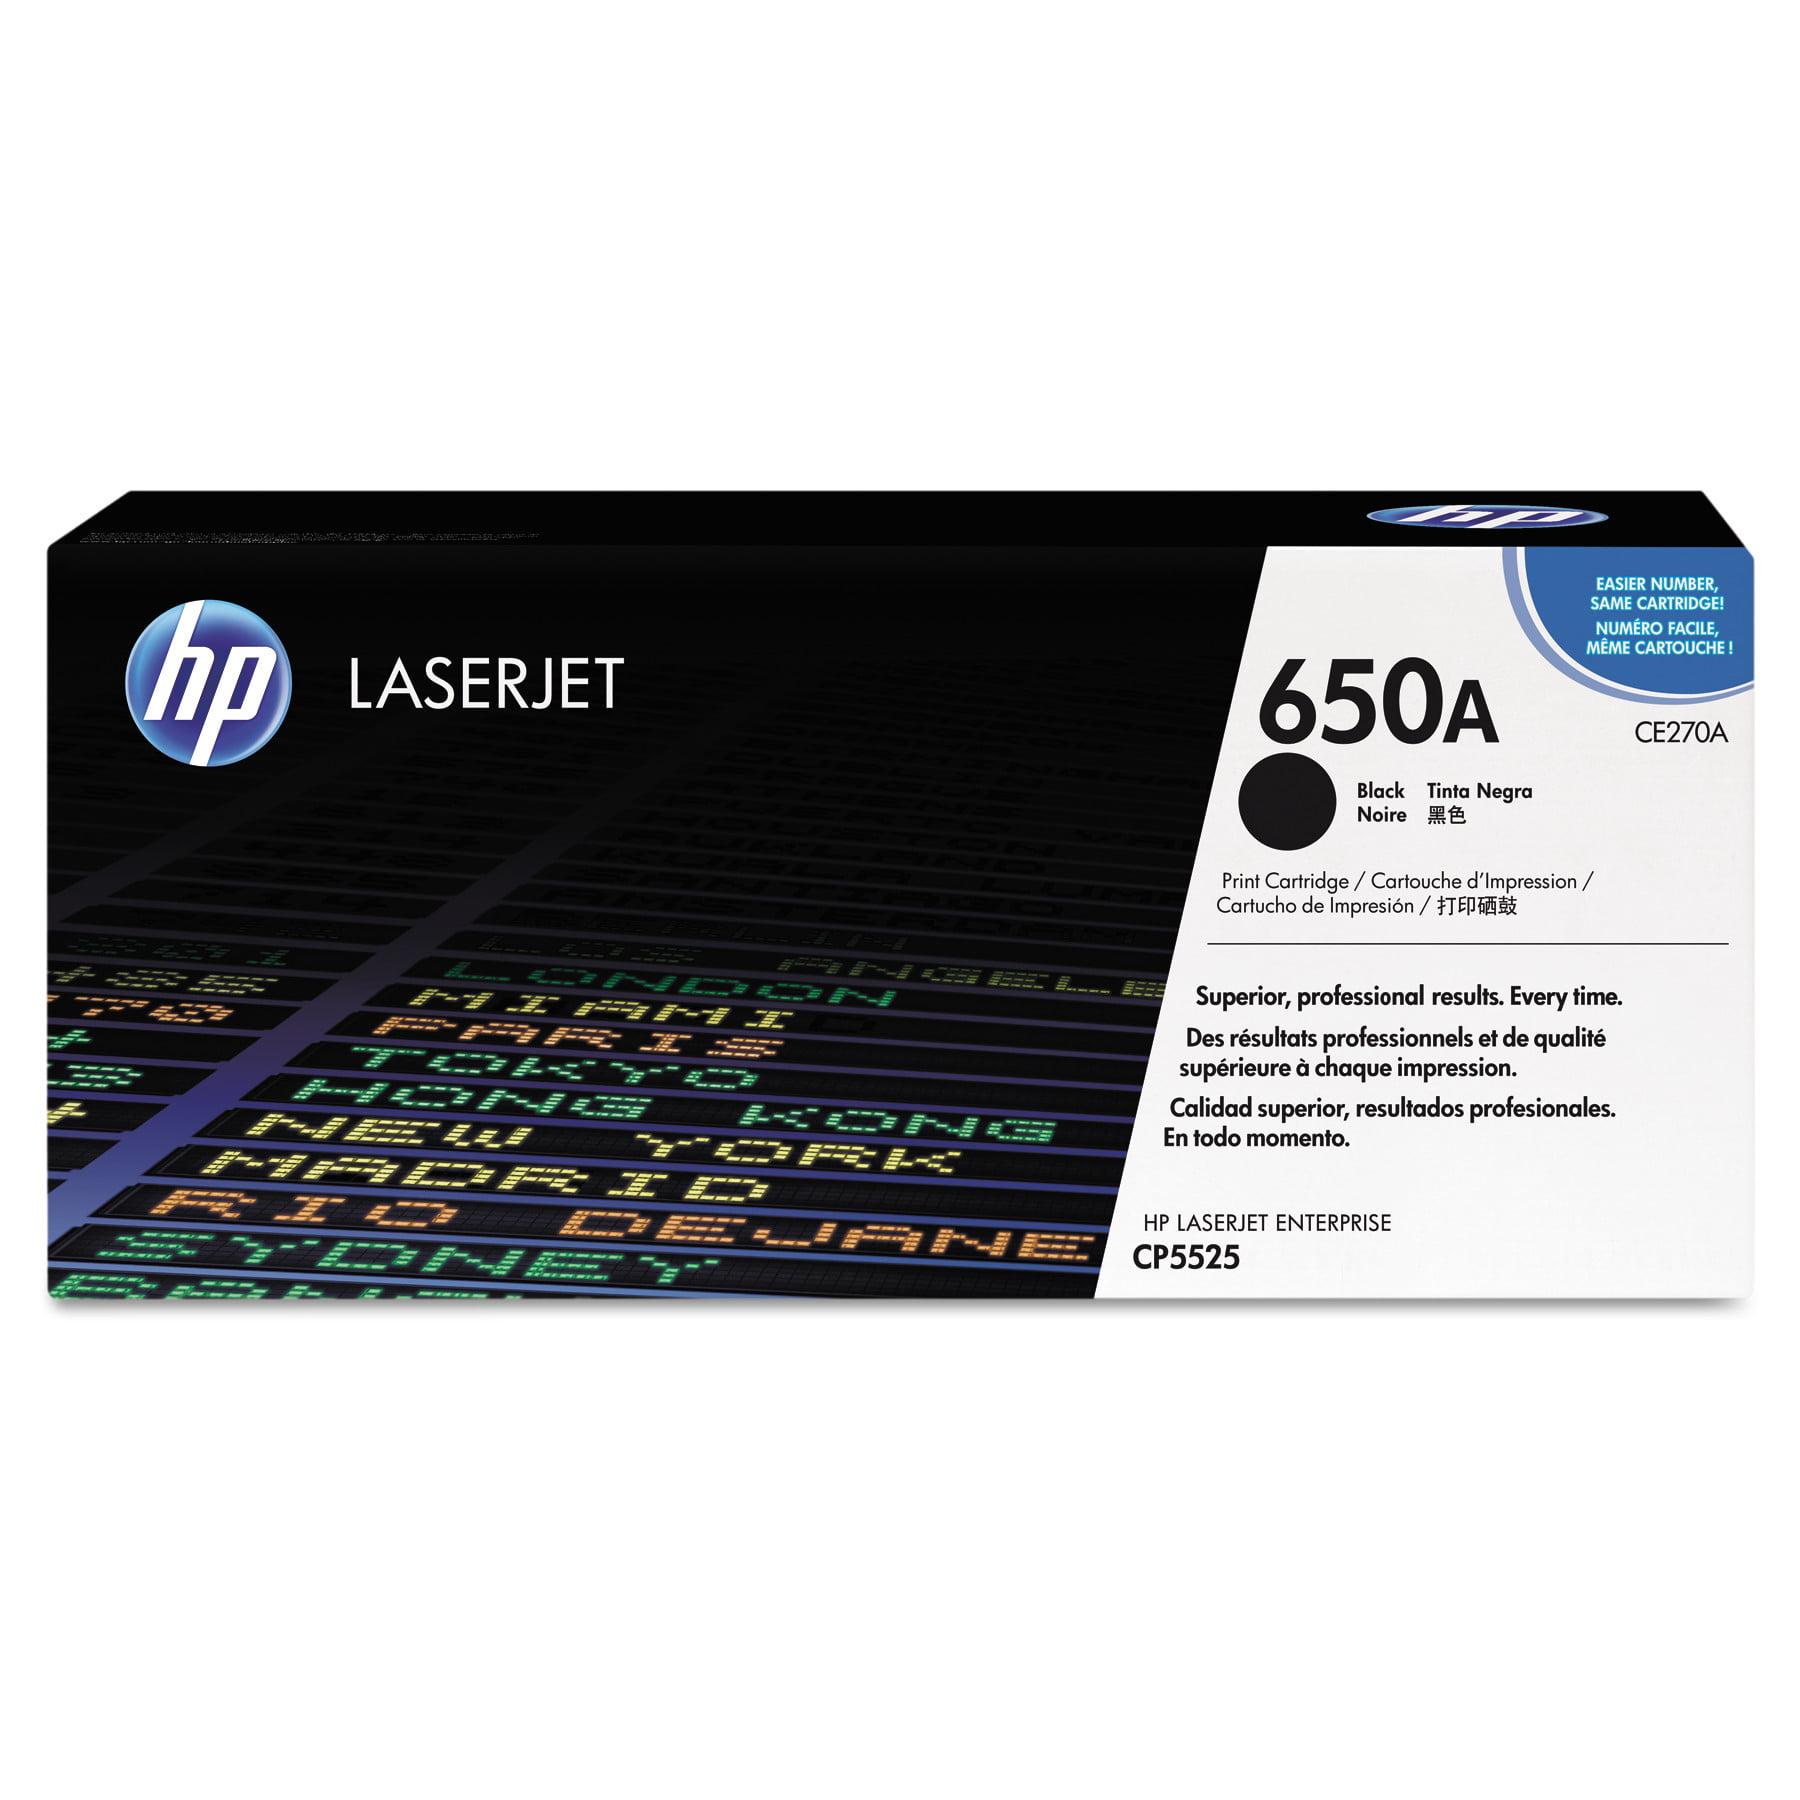 HP HP 650A, (CE270A) Black Original LaserJet Toner Cartridge by HP